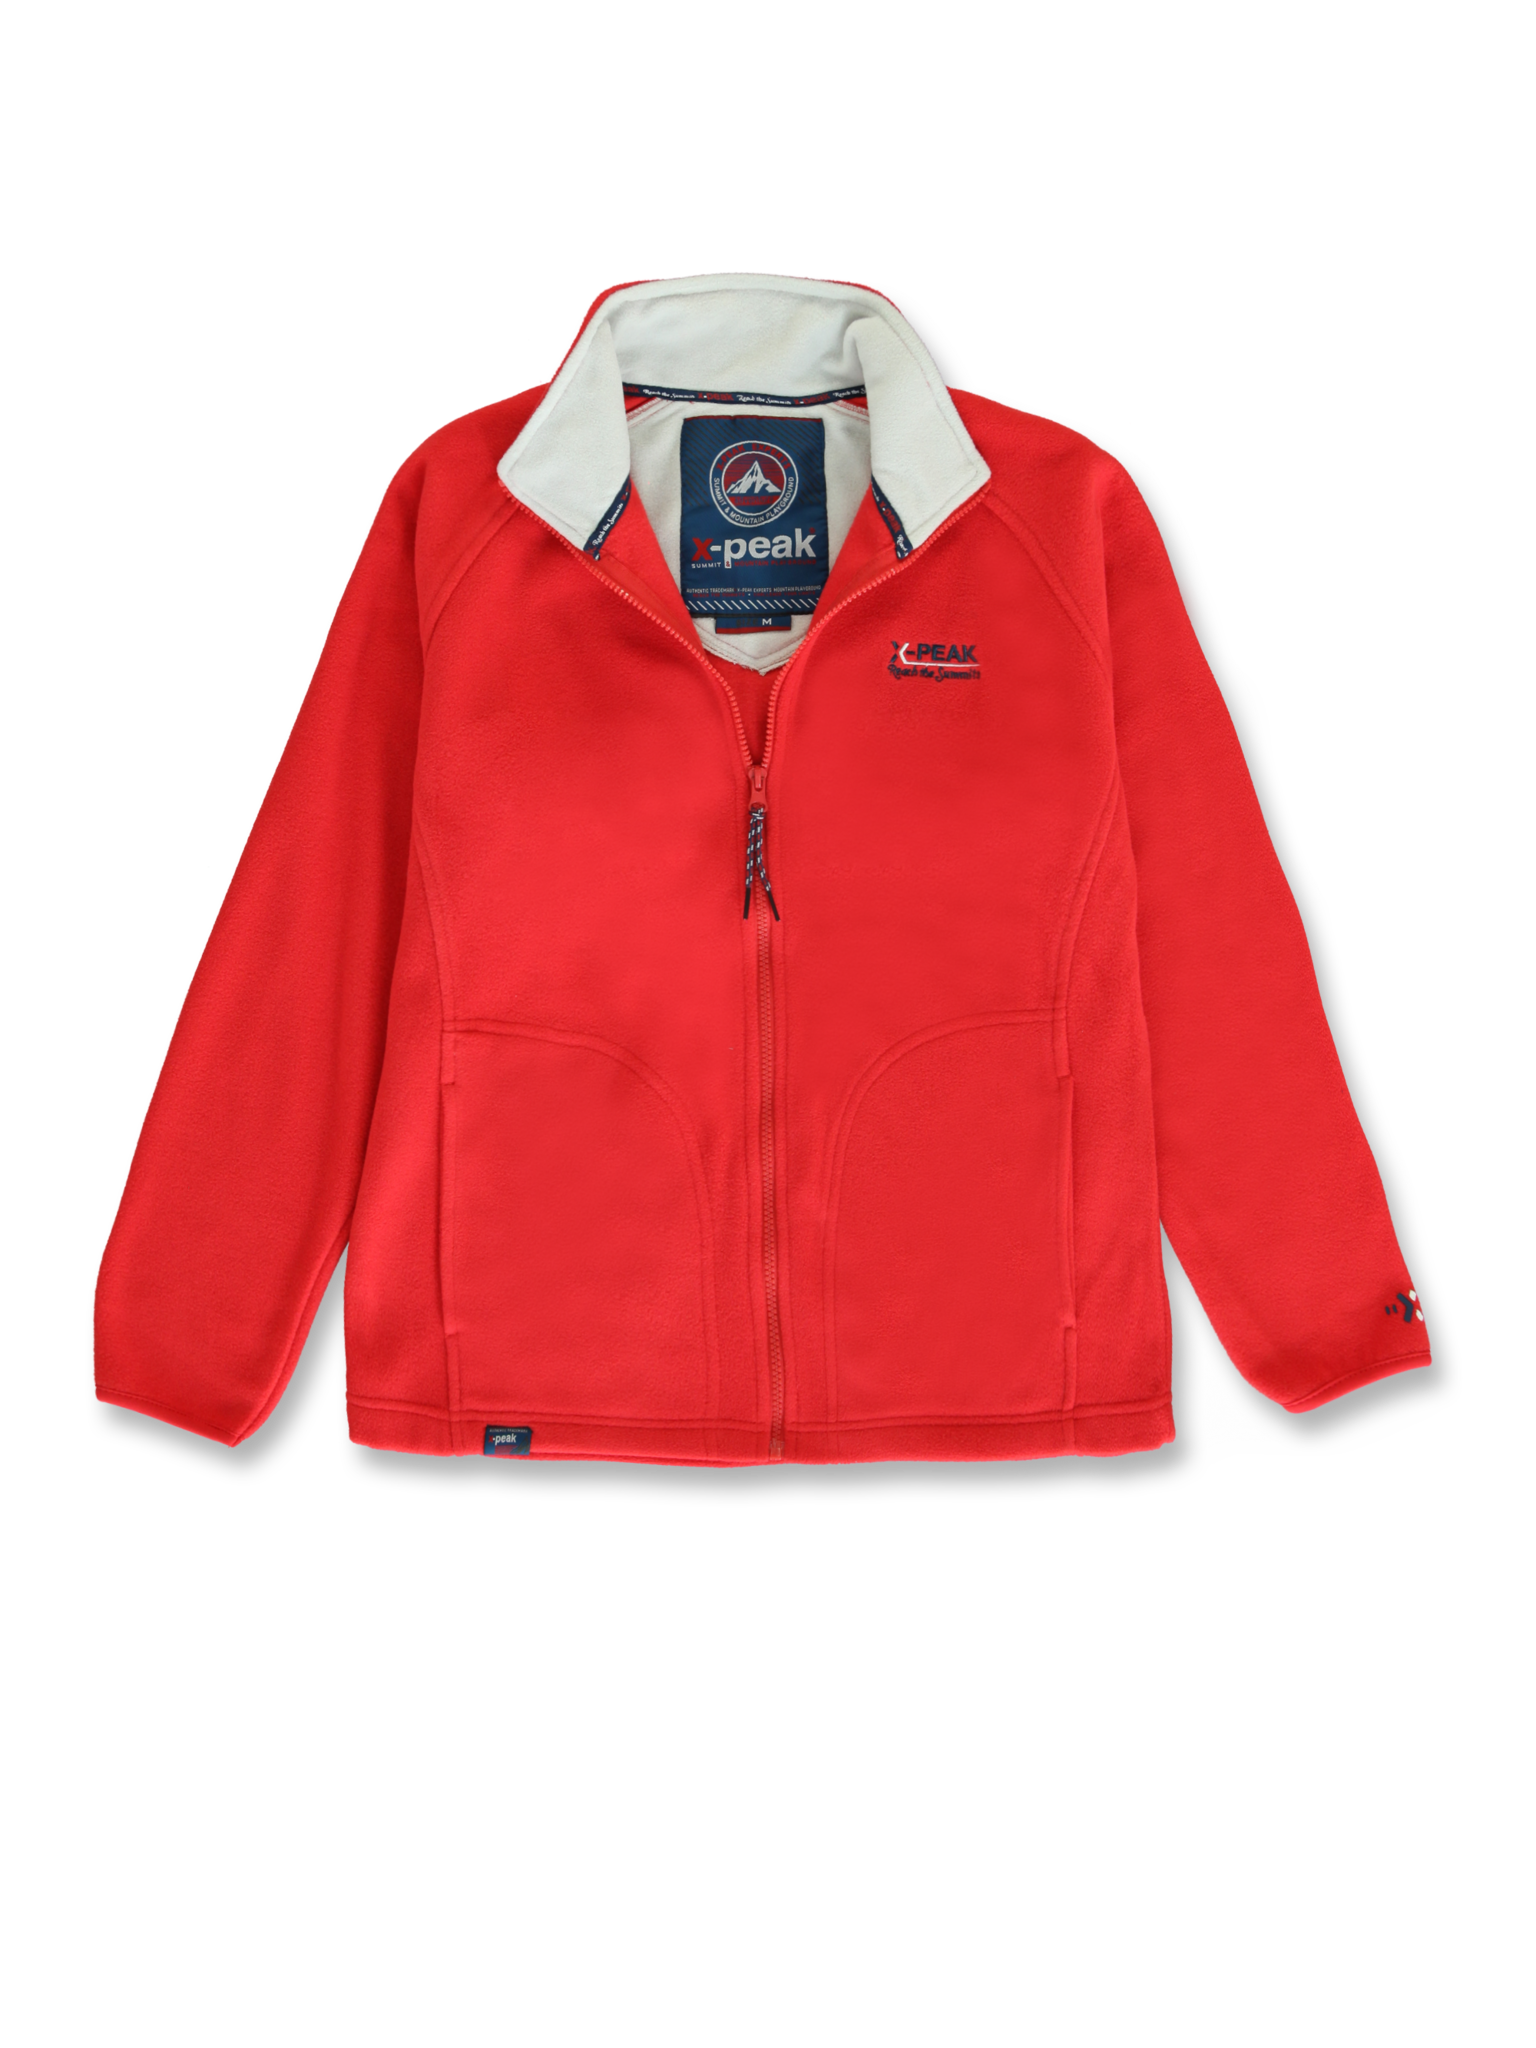 All Brands   Winterproducts Ladies   Cardigan Sweater   25 pcs/box